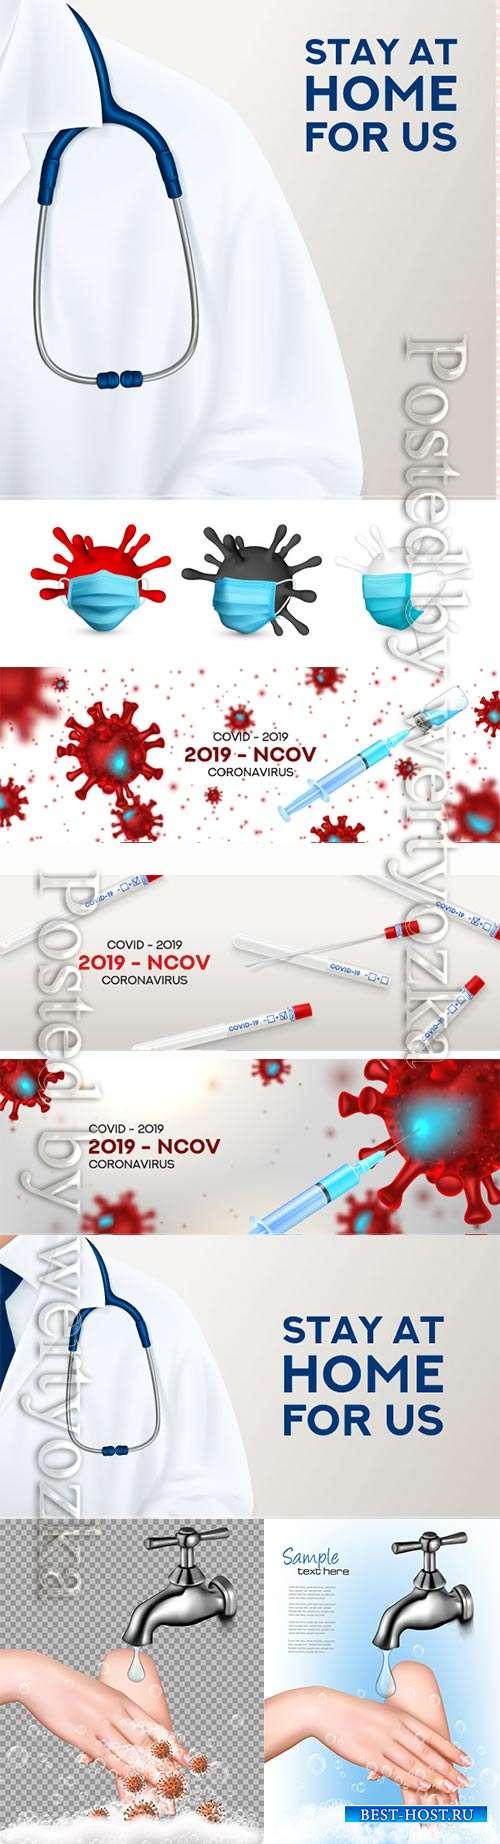 COVID 19, Coranavirus vector illustration sets # 6